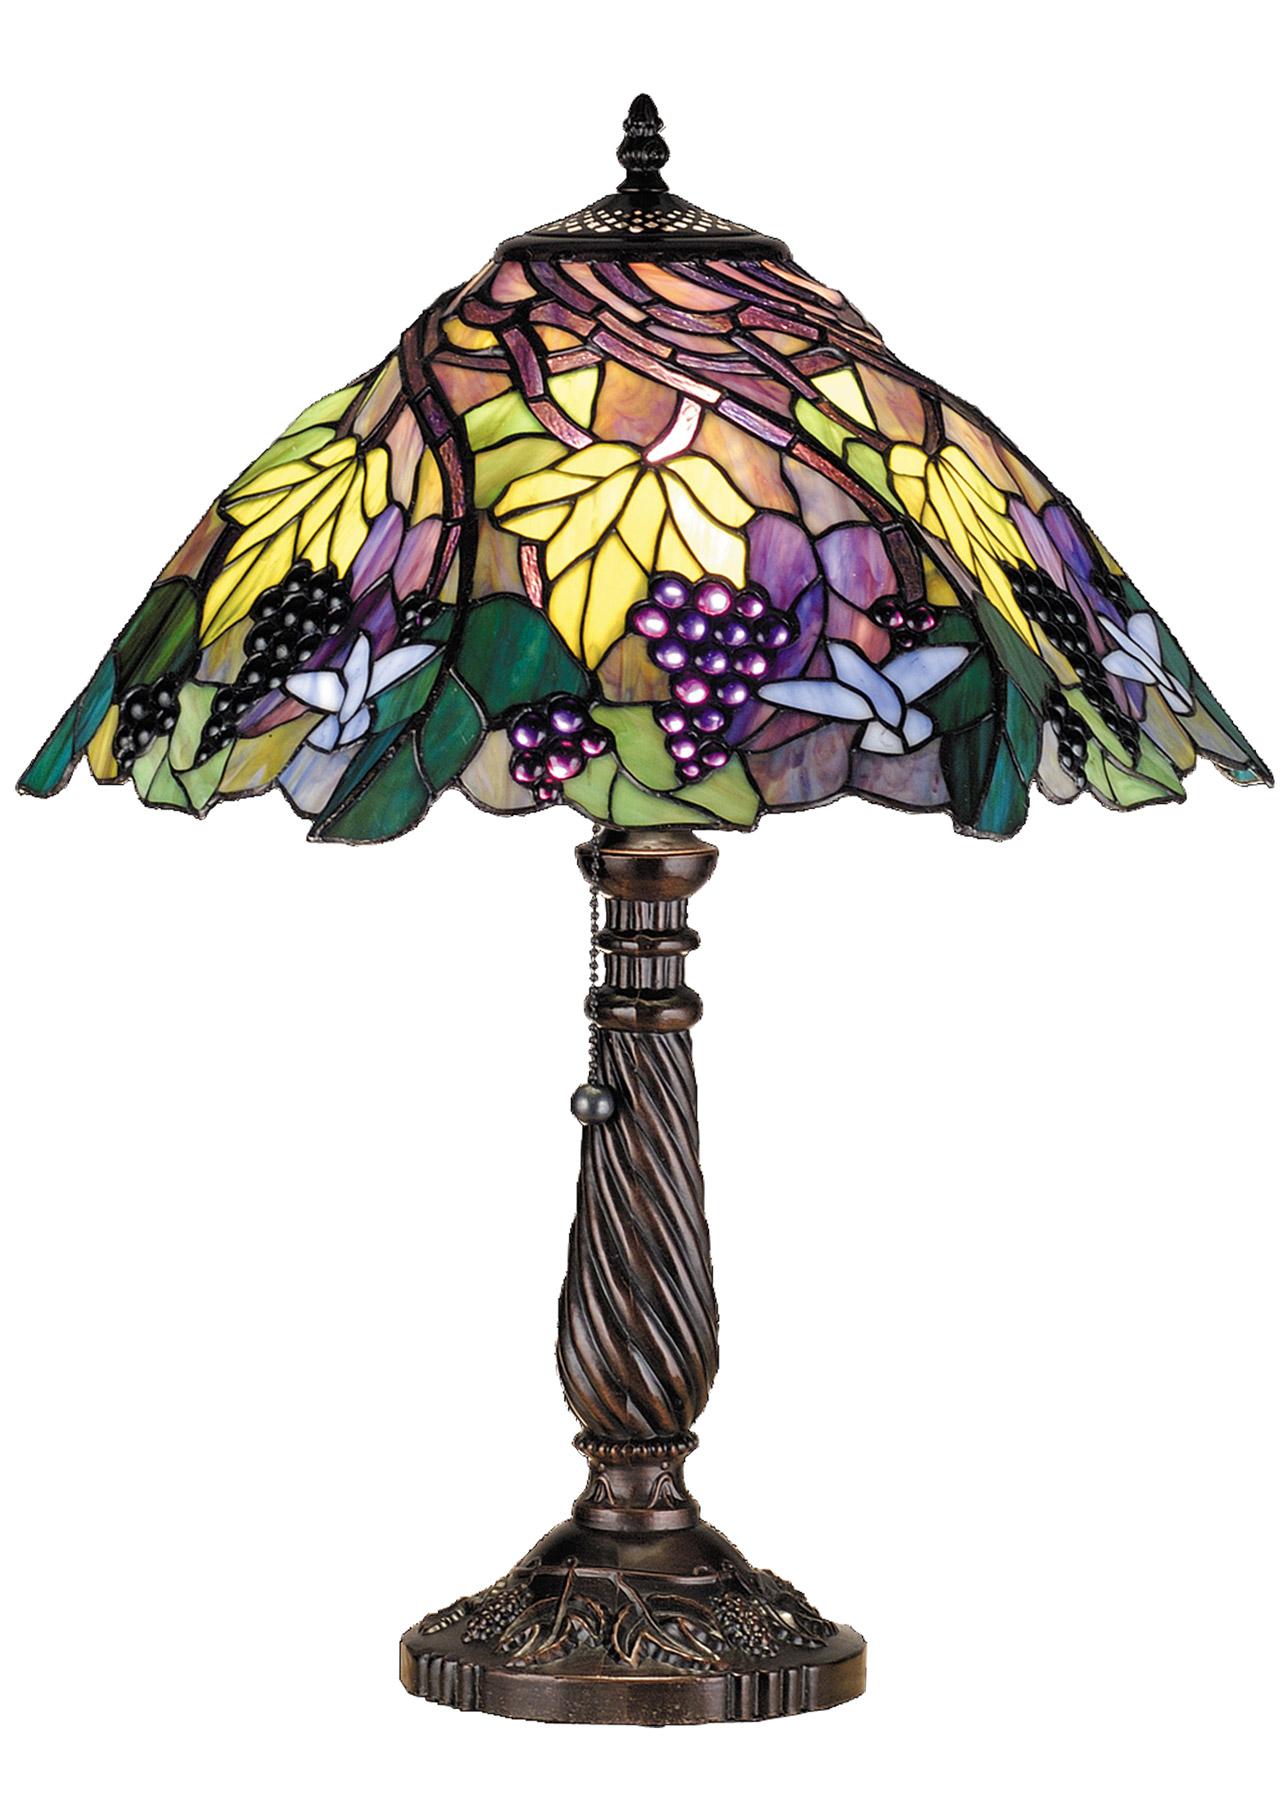 Meyda 82303 Tiffany Spiral Grape Table Lamp